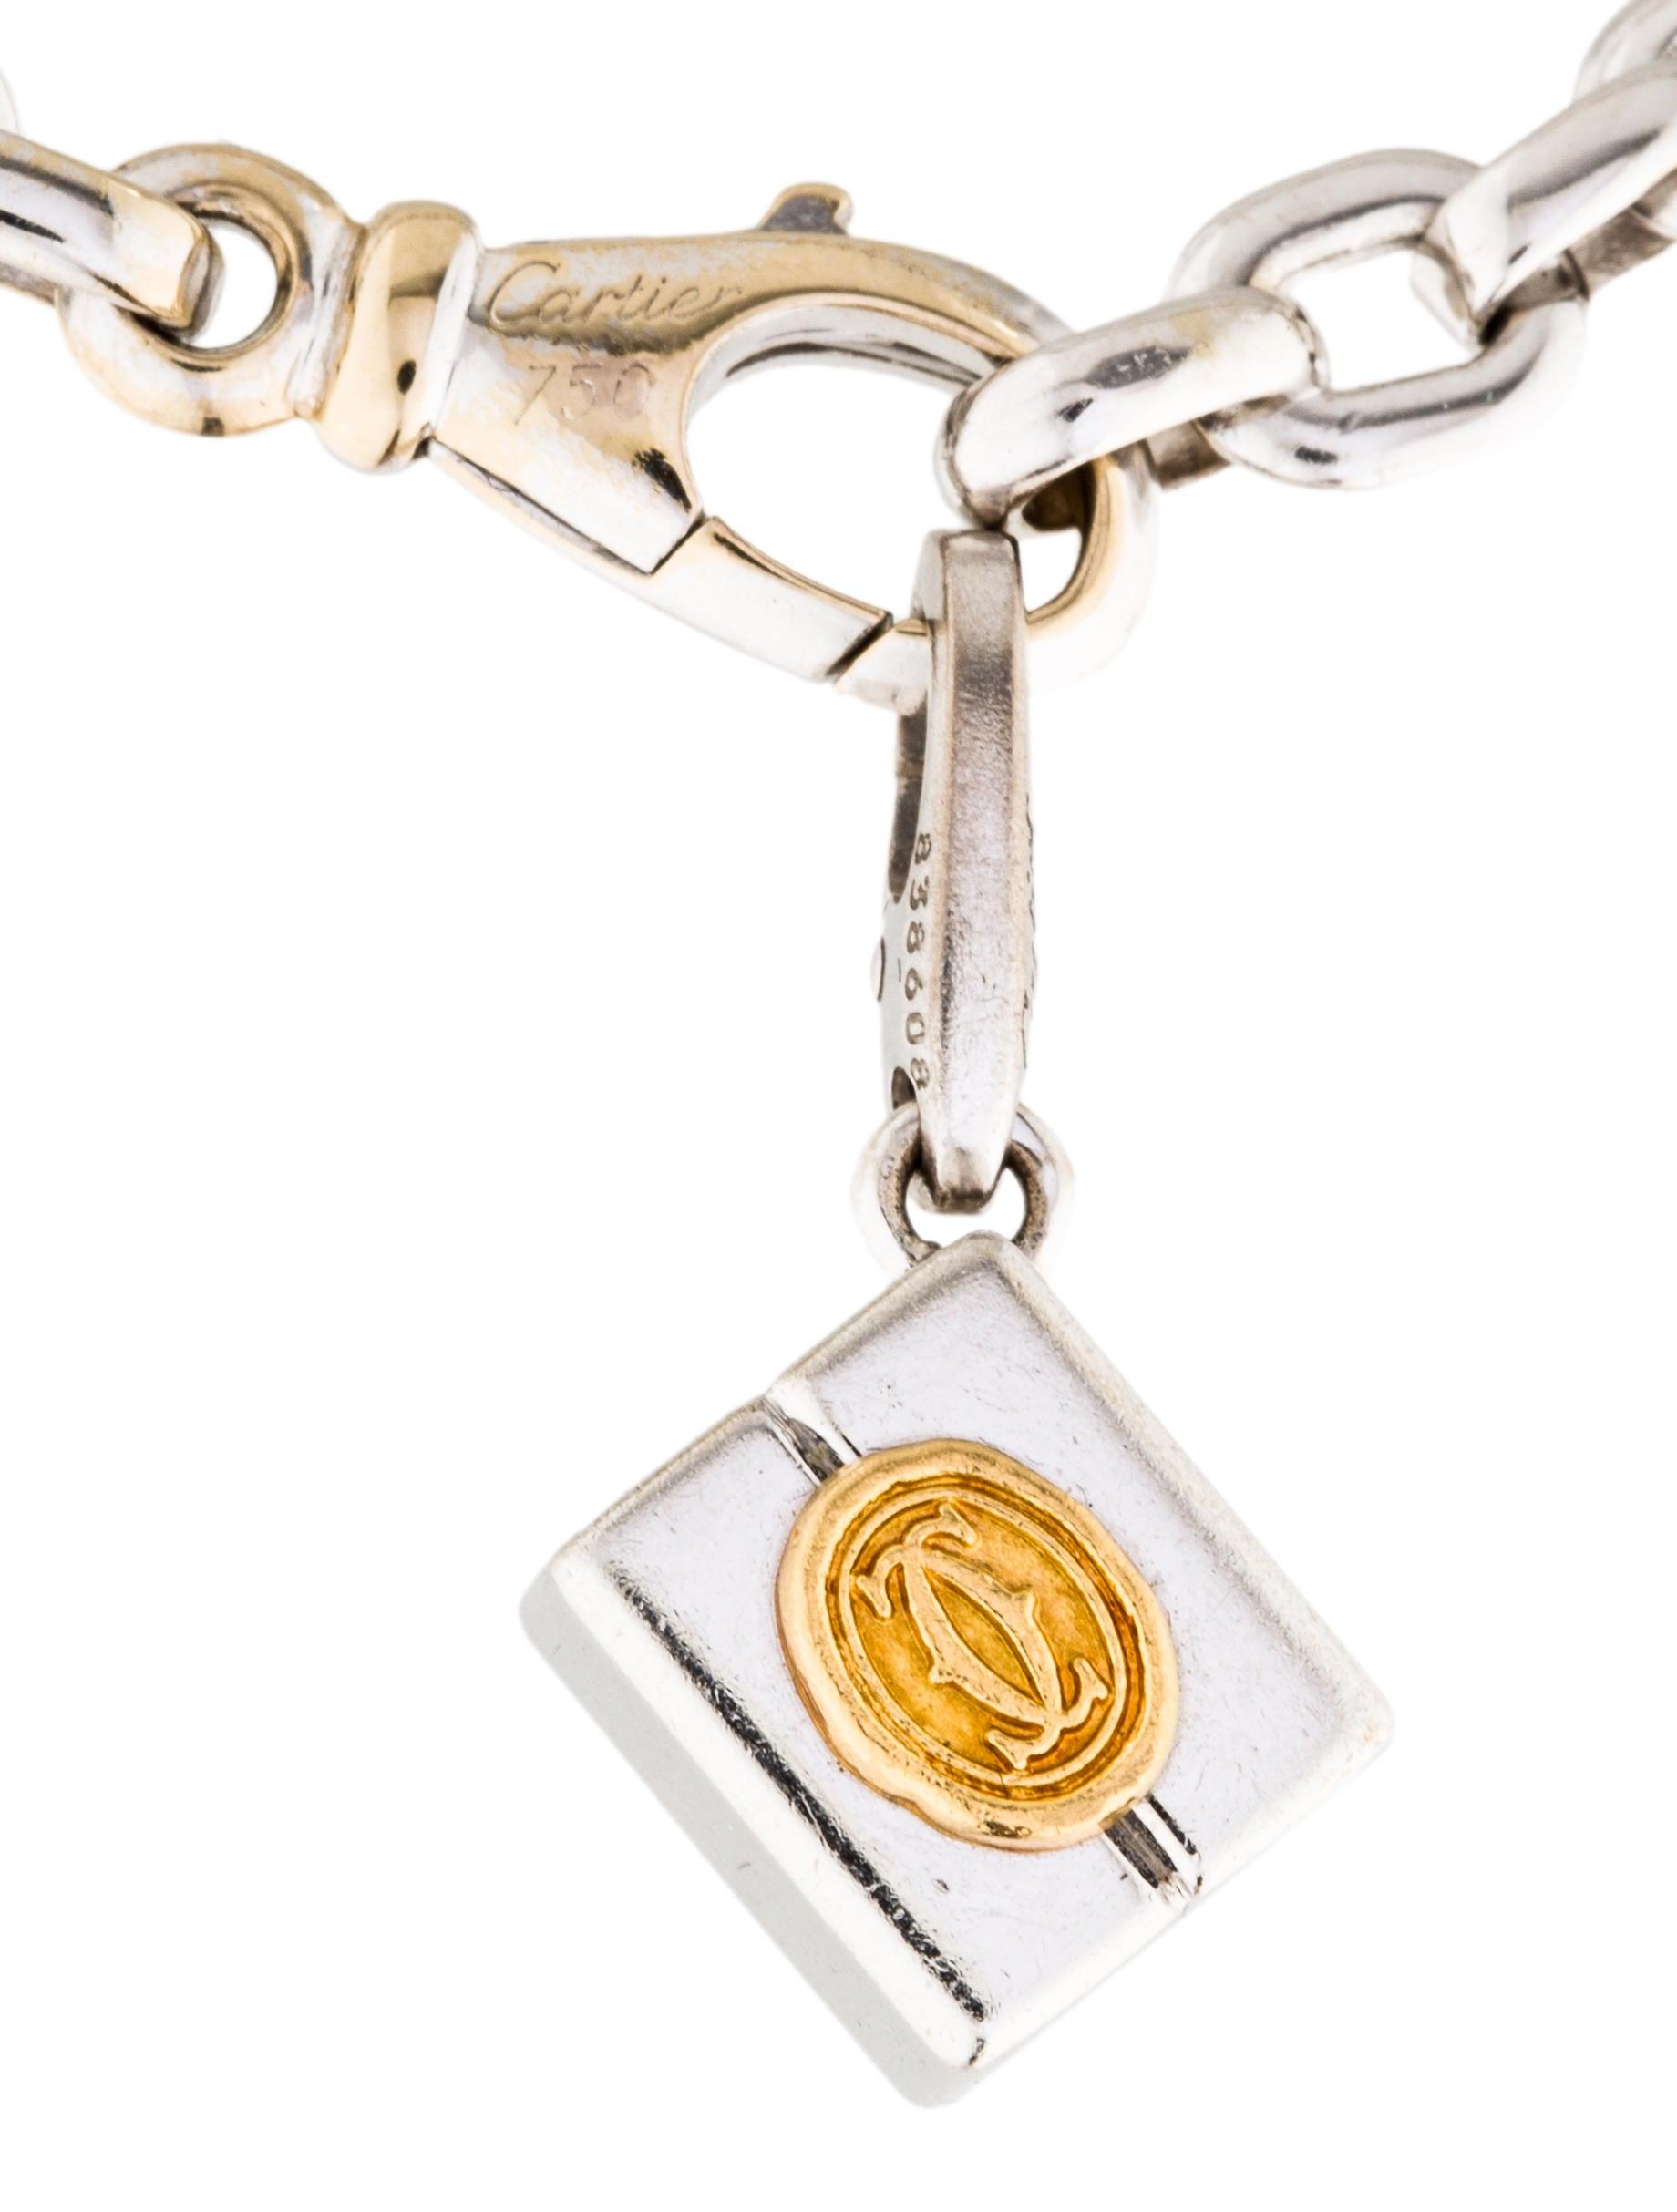 cartier charm link bracelet bracelets crt31027 the